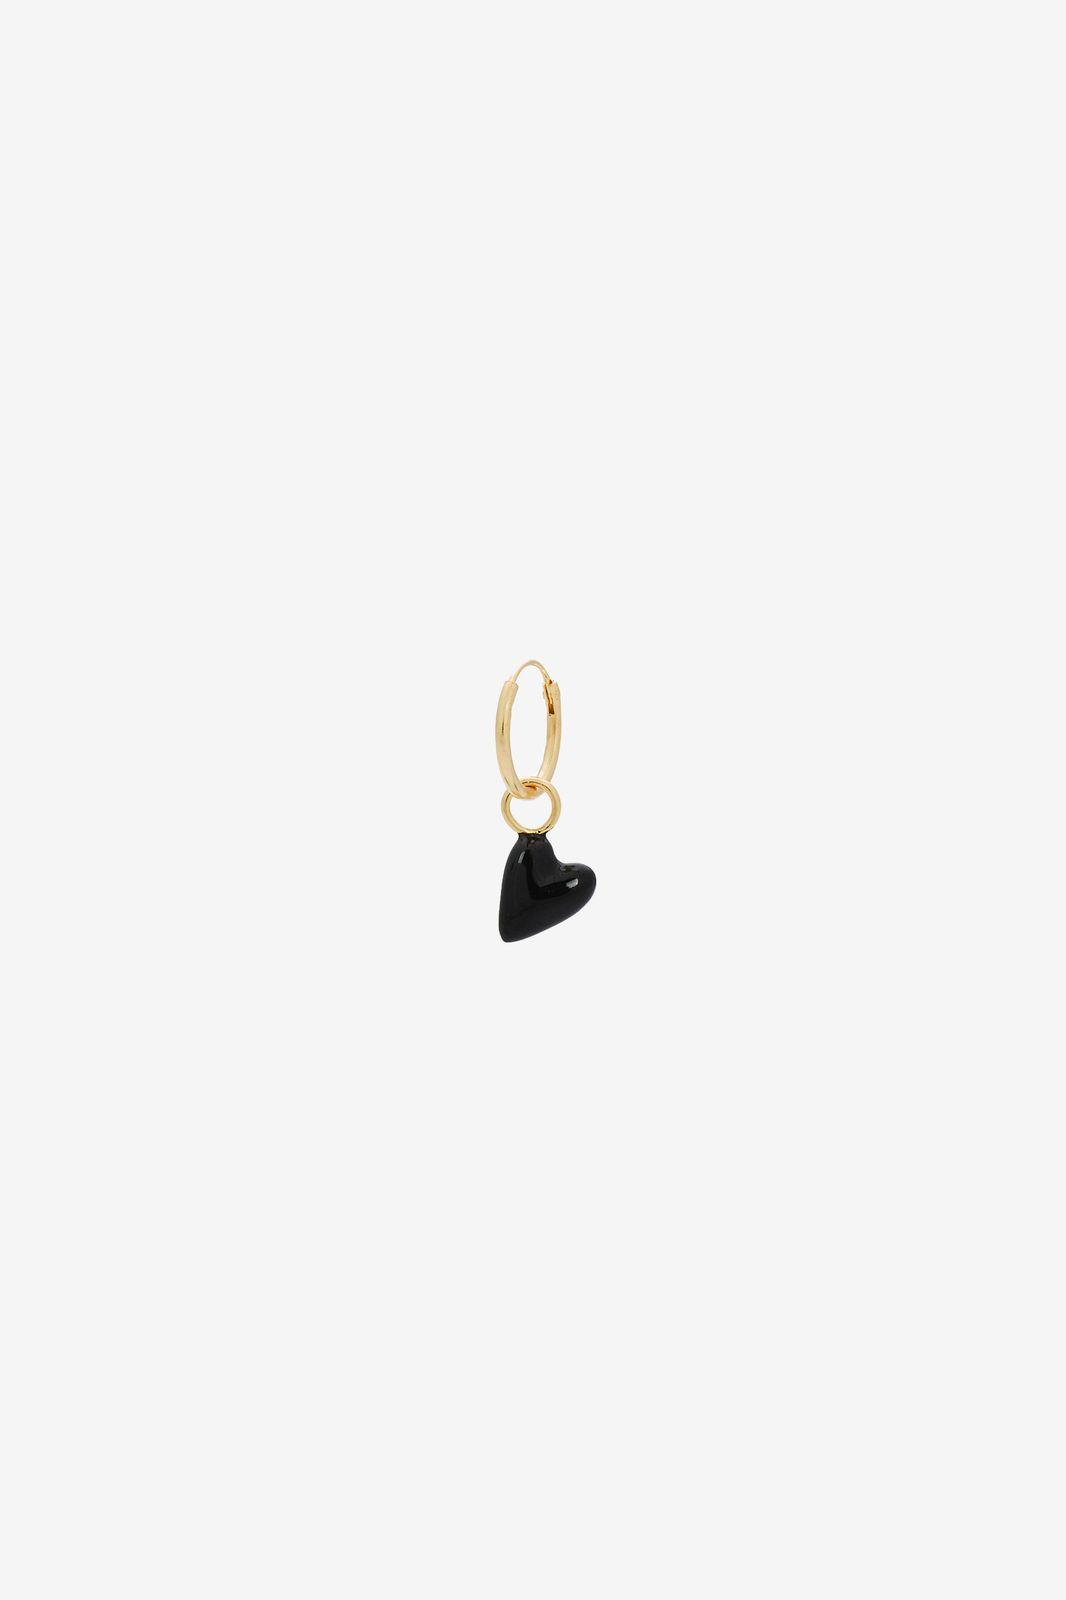 Anna+Nina single la muerta heart ring earring goldplated - Dames   Sissy-Boy